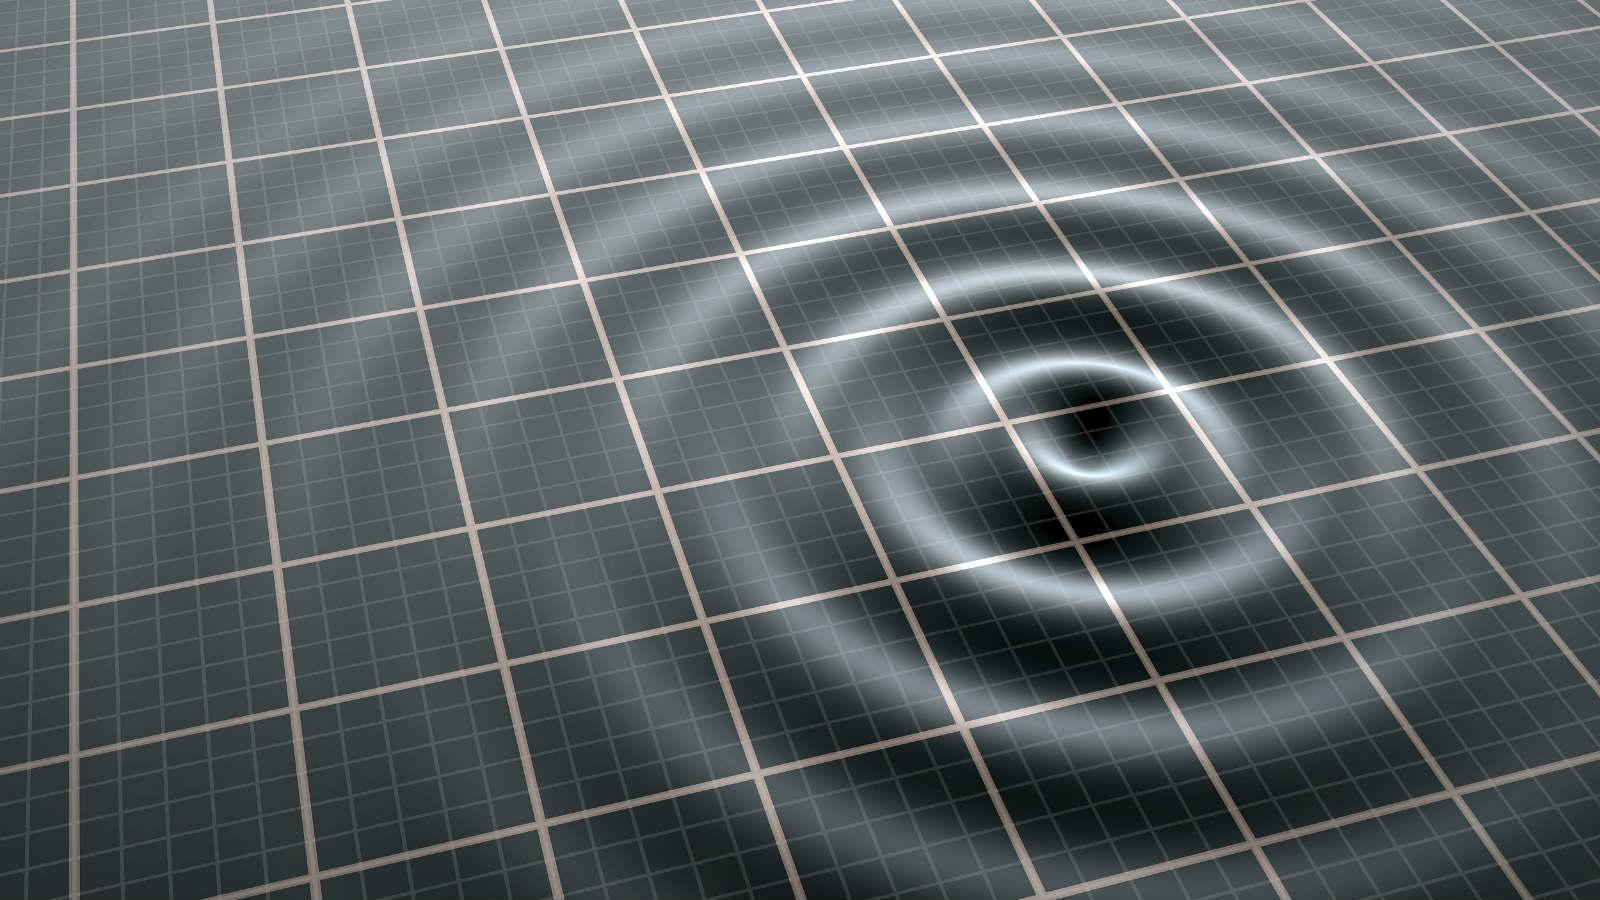 5.2-magnitude quake hits SE of Hachijo-jima, Japan: USGS